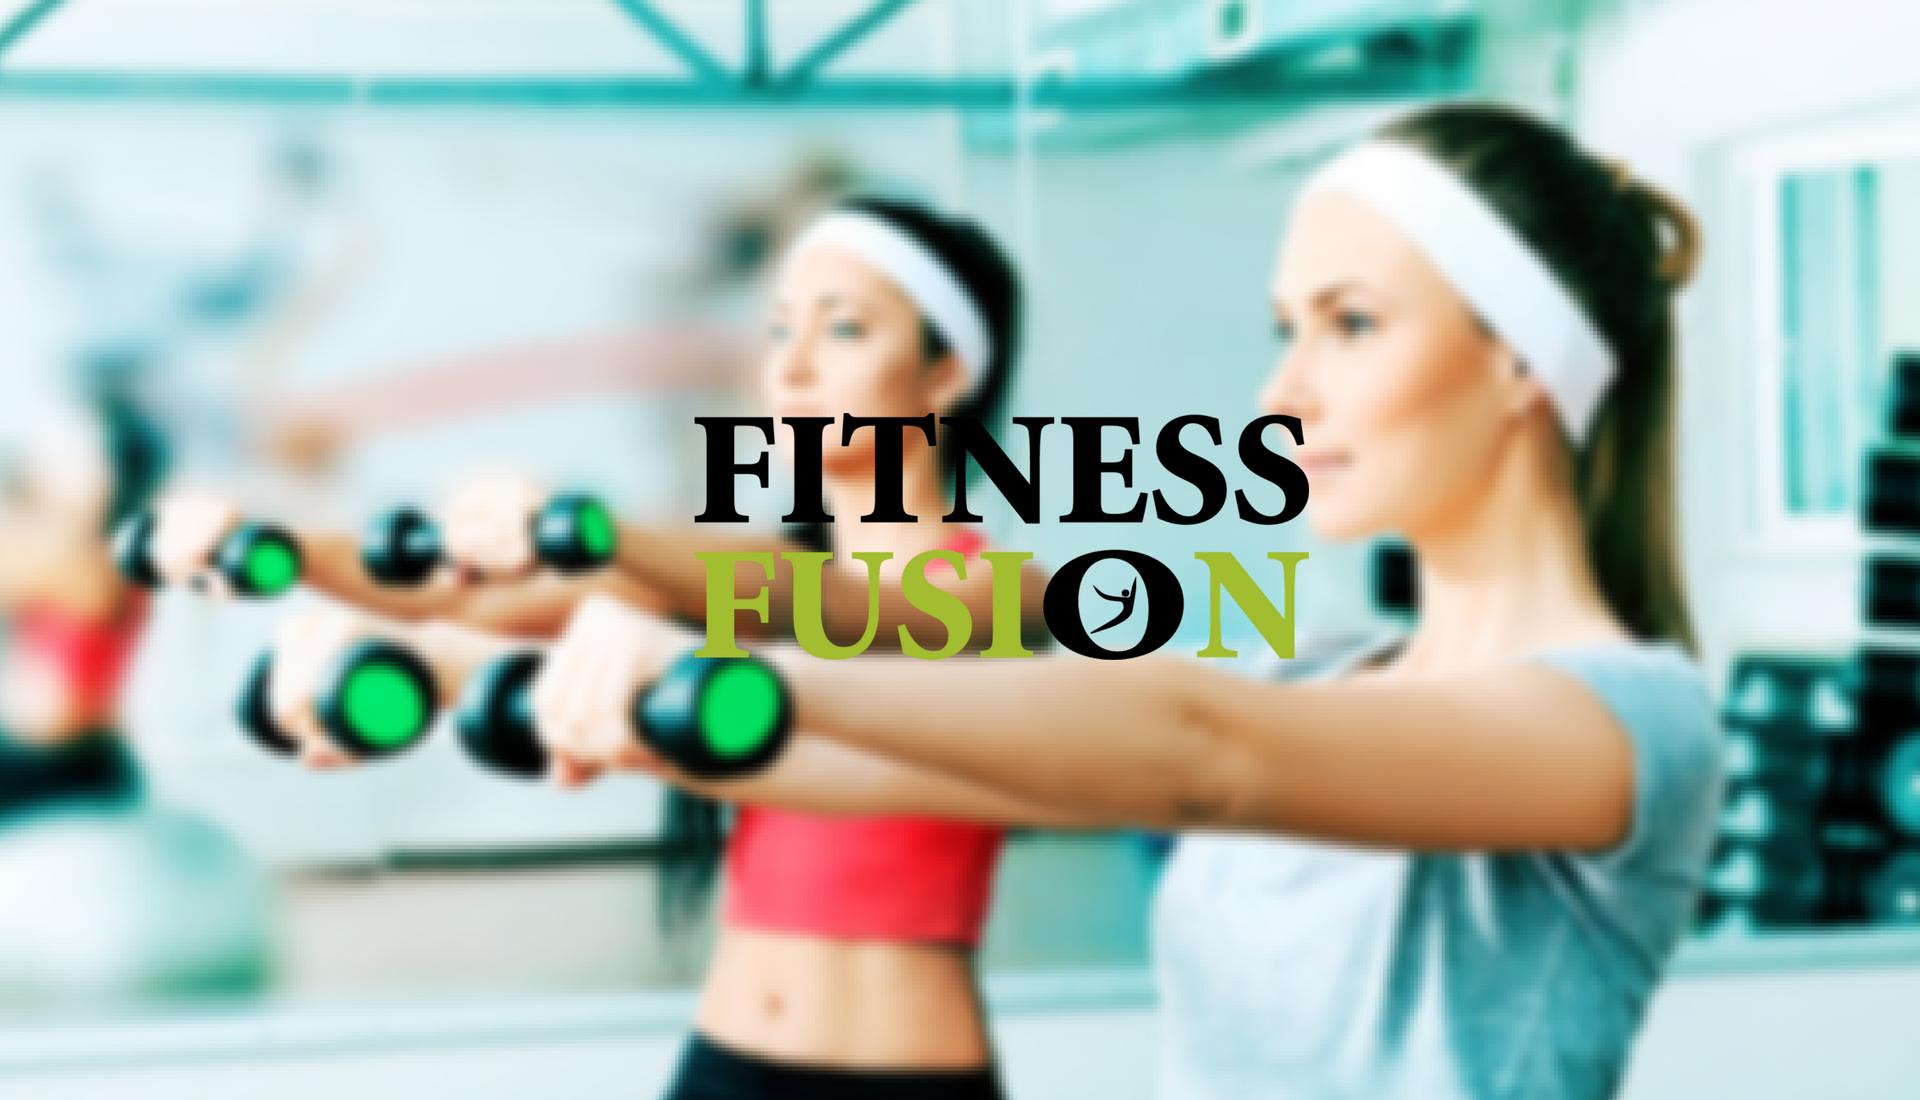 Fitnessfusion2